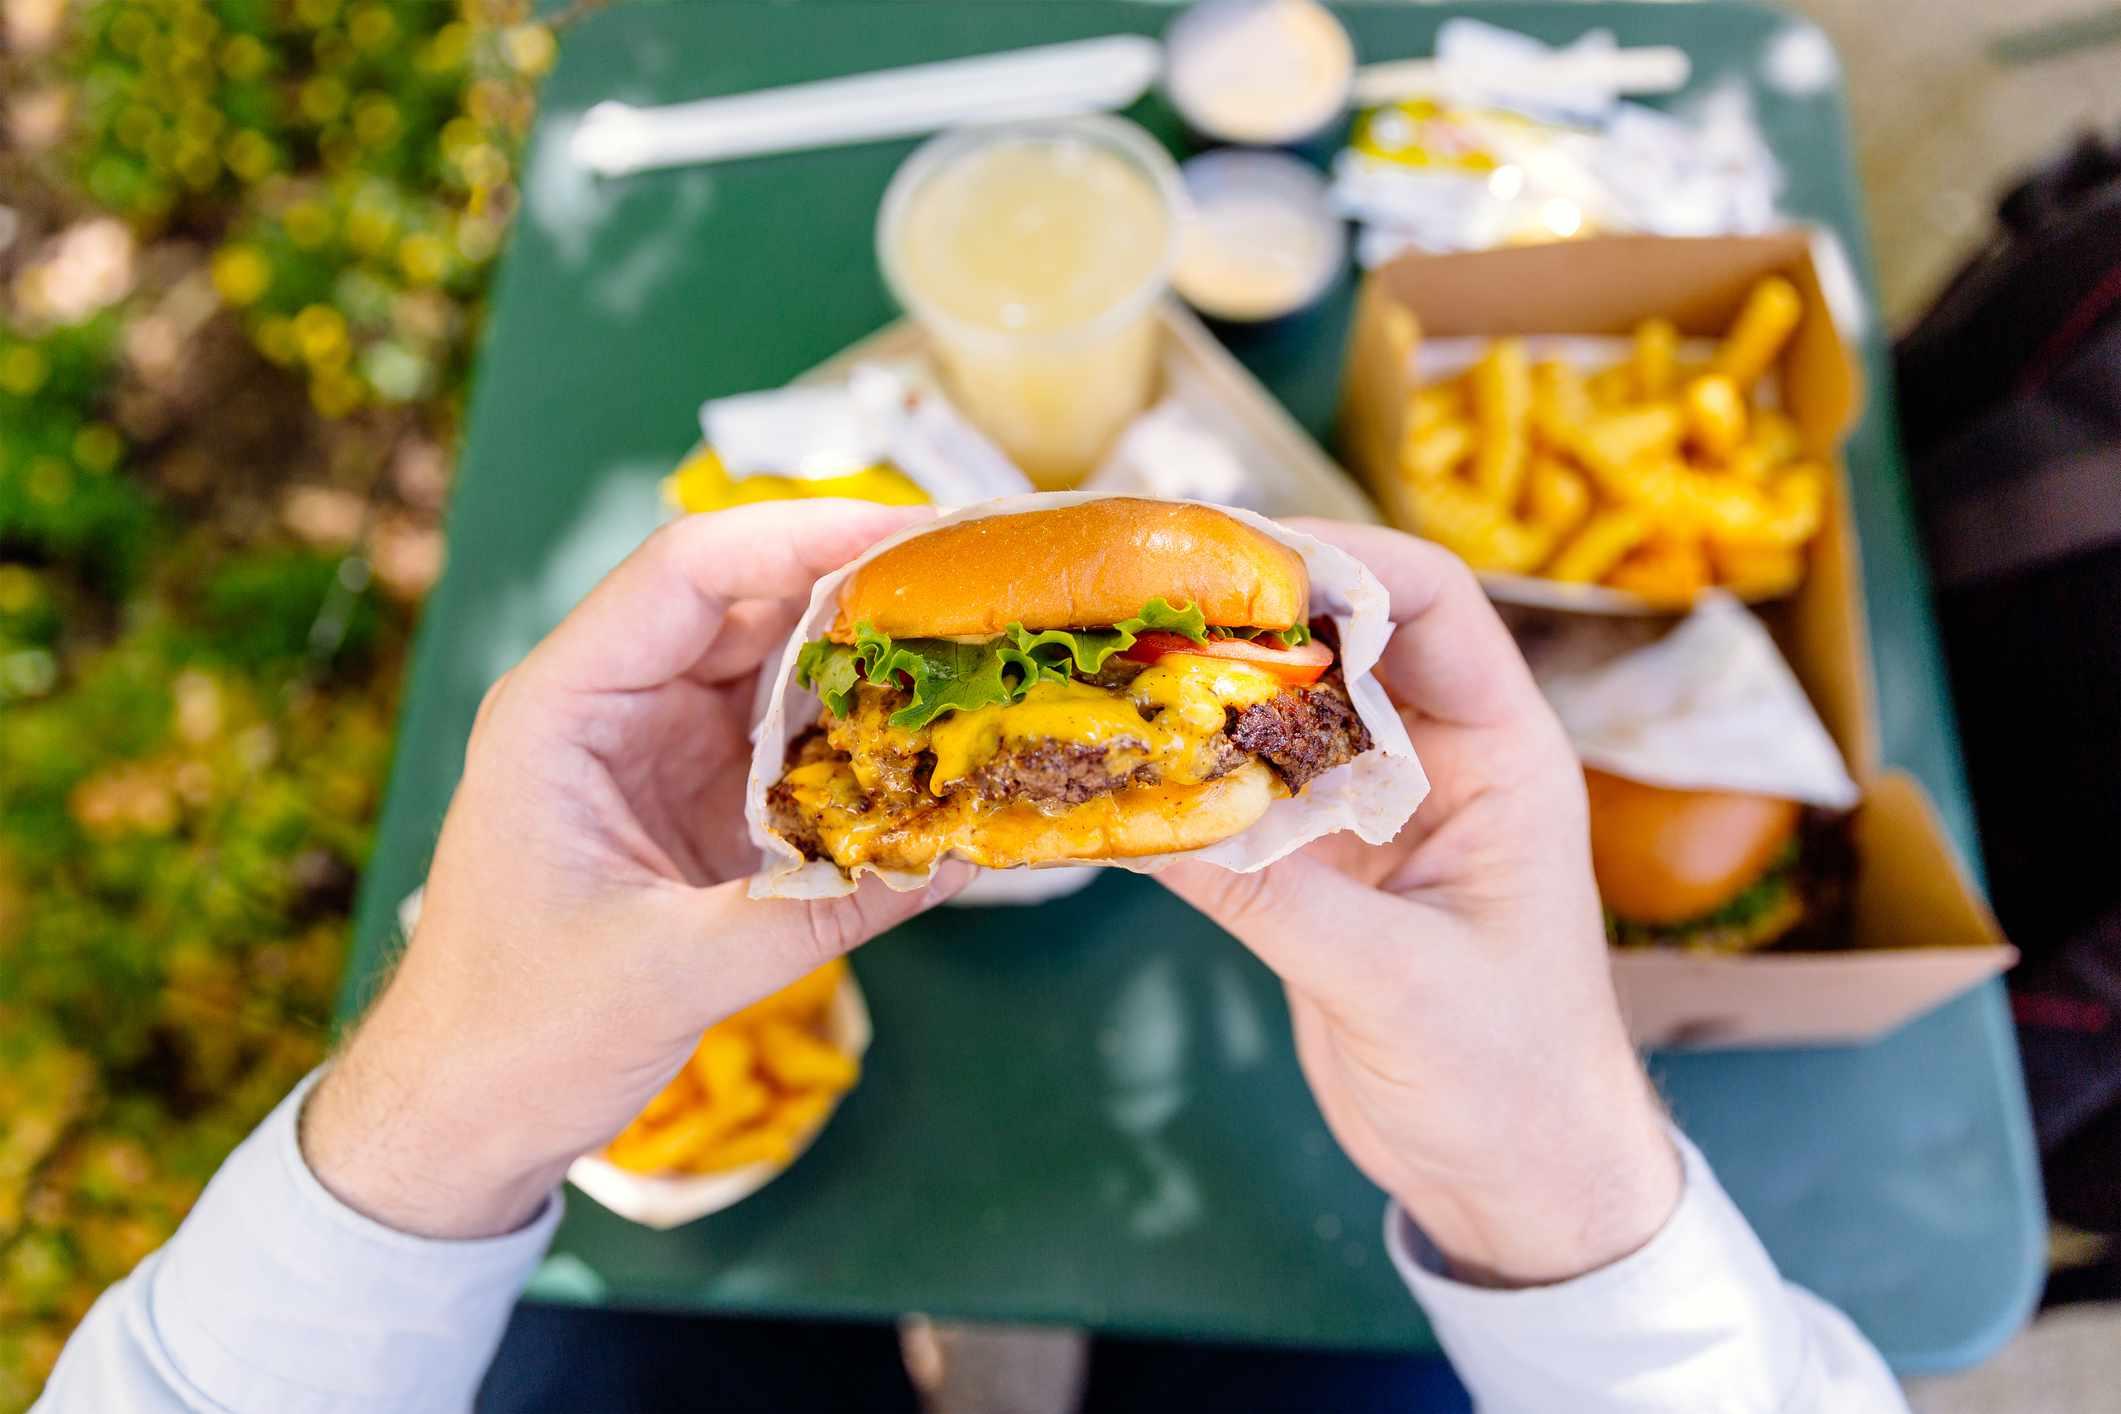 Man eating cheeseburger, personal perspective view